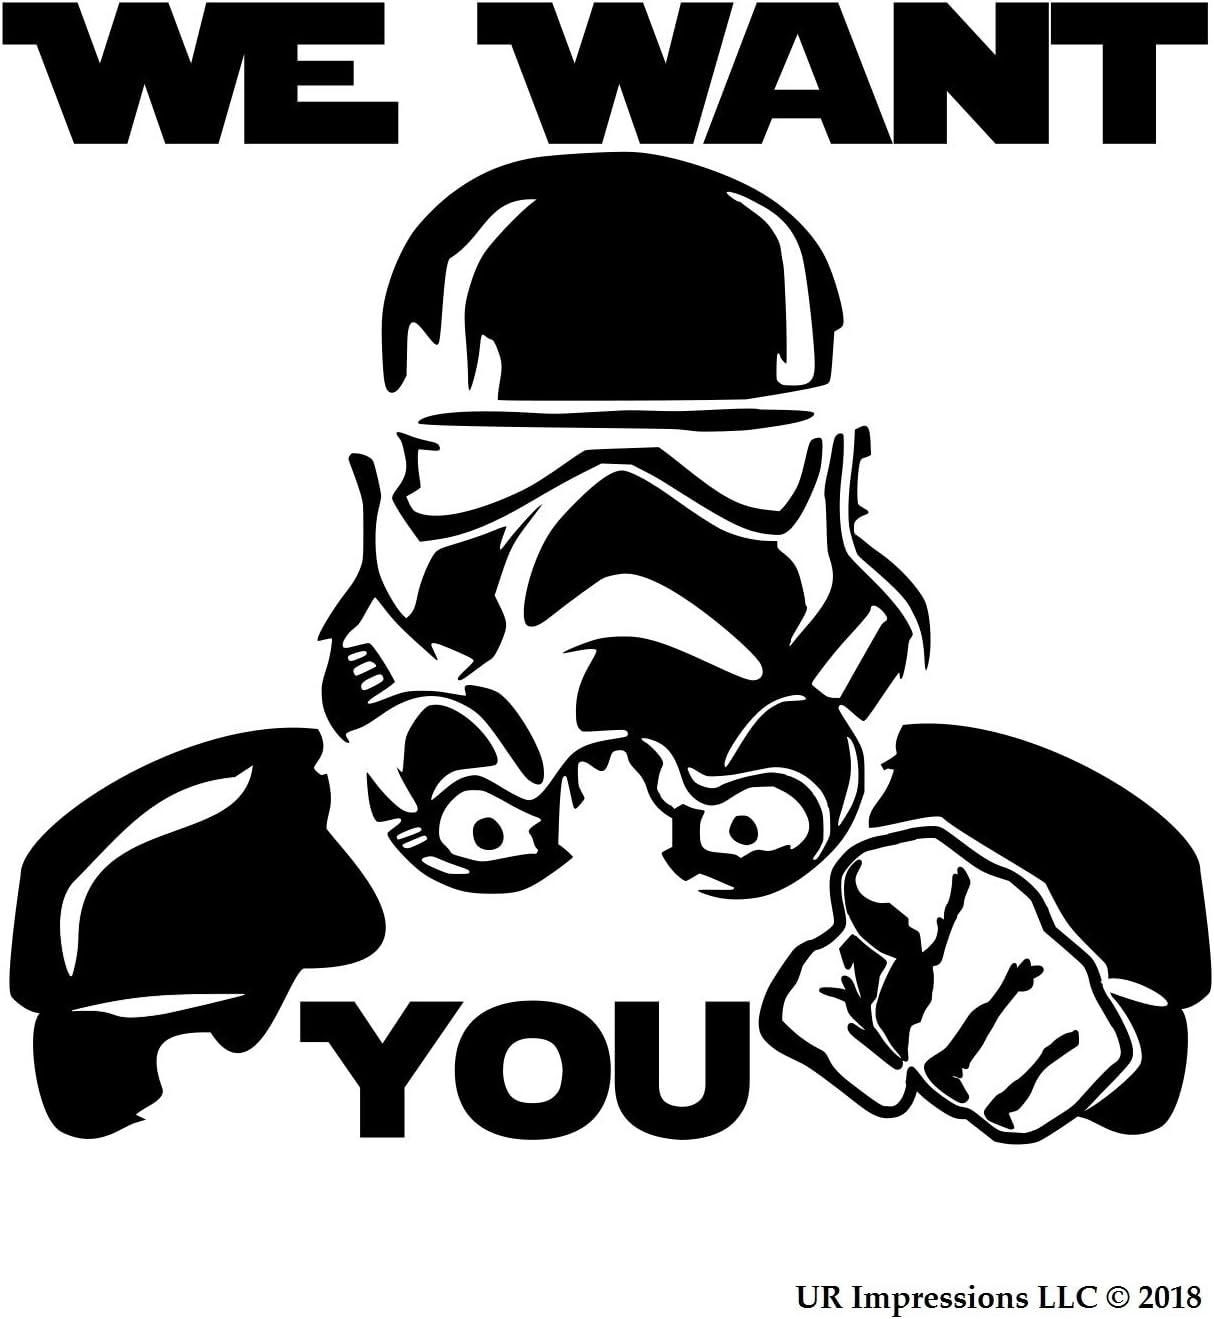 UR Impressions Blk We Want You - Storm Trooper Recruitment Decal Vinyl Sticker Graphics for Cars Trucks SUV Vans Walls Windows Laptop|Black|5.5 X 5.3 Inch|URI210-B